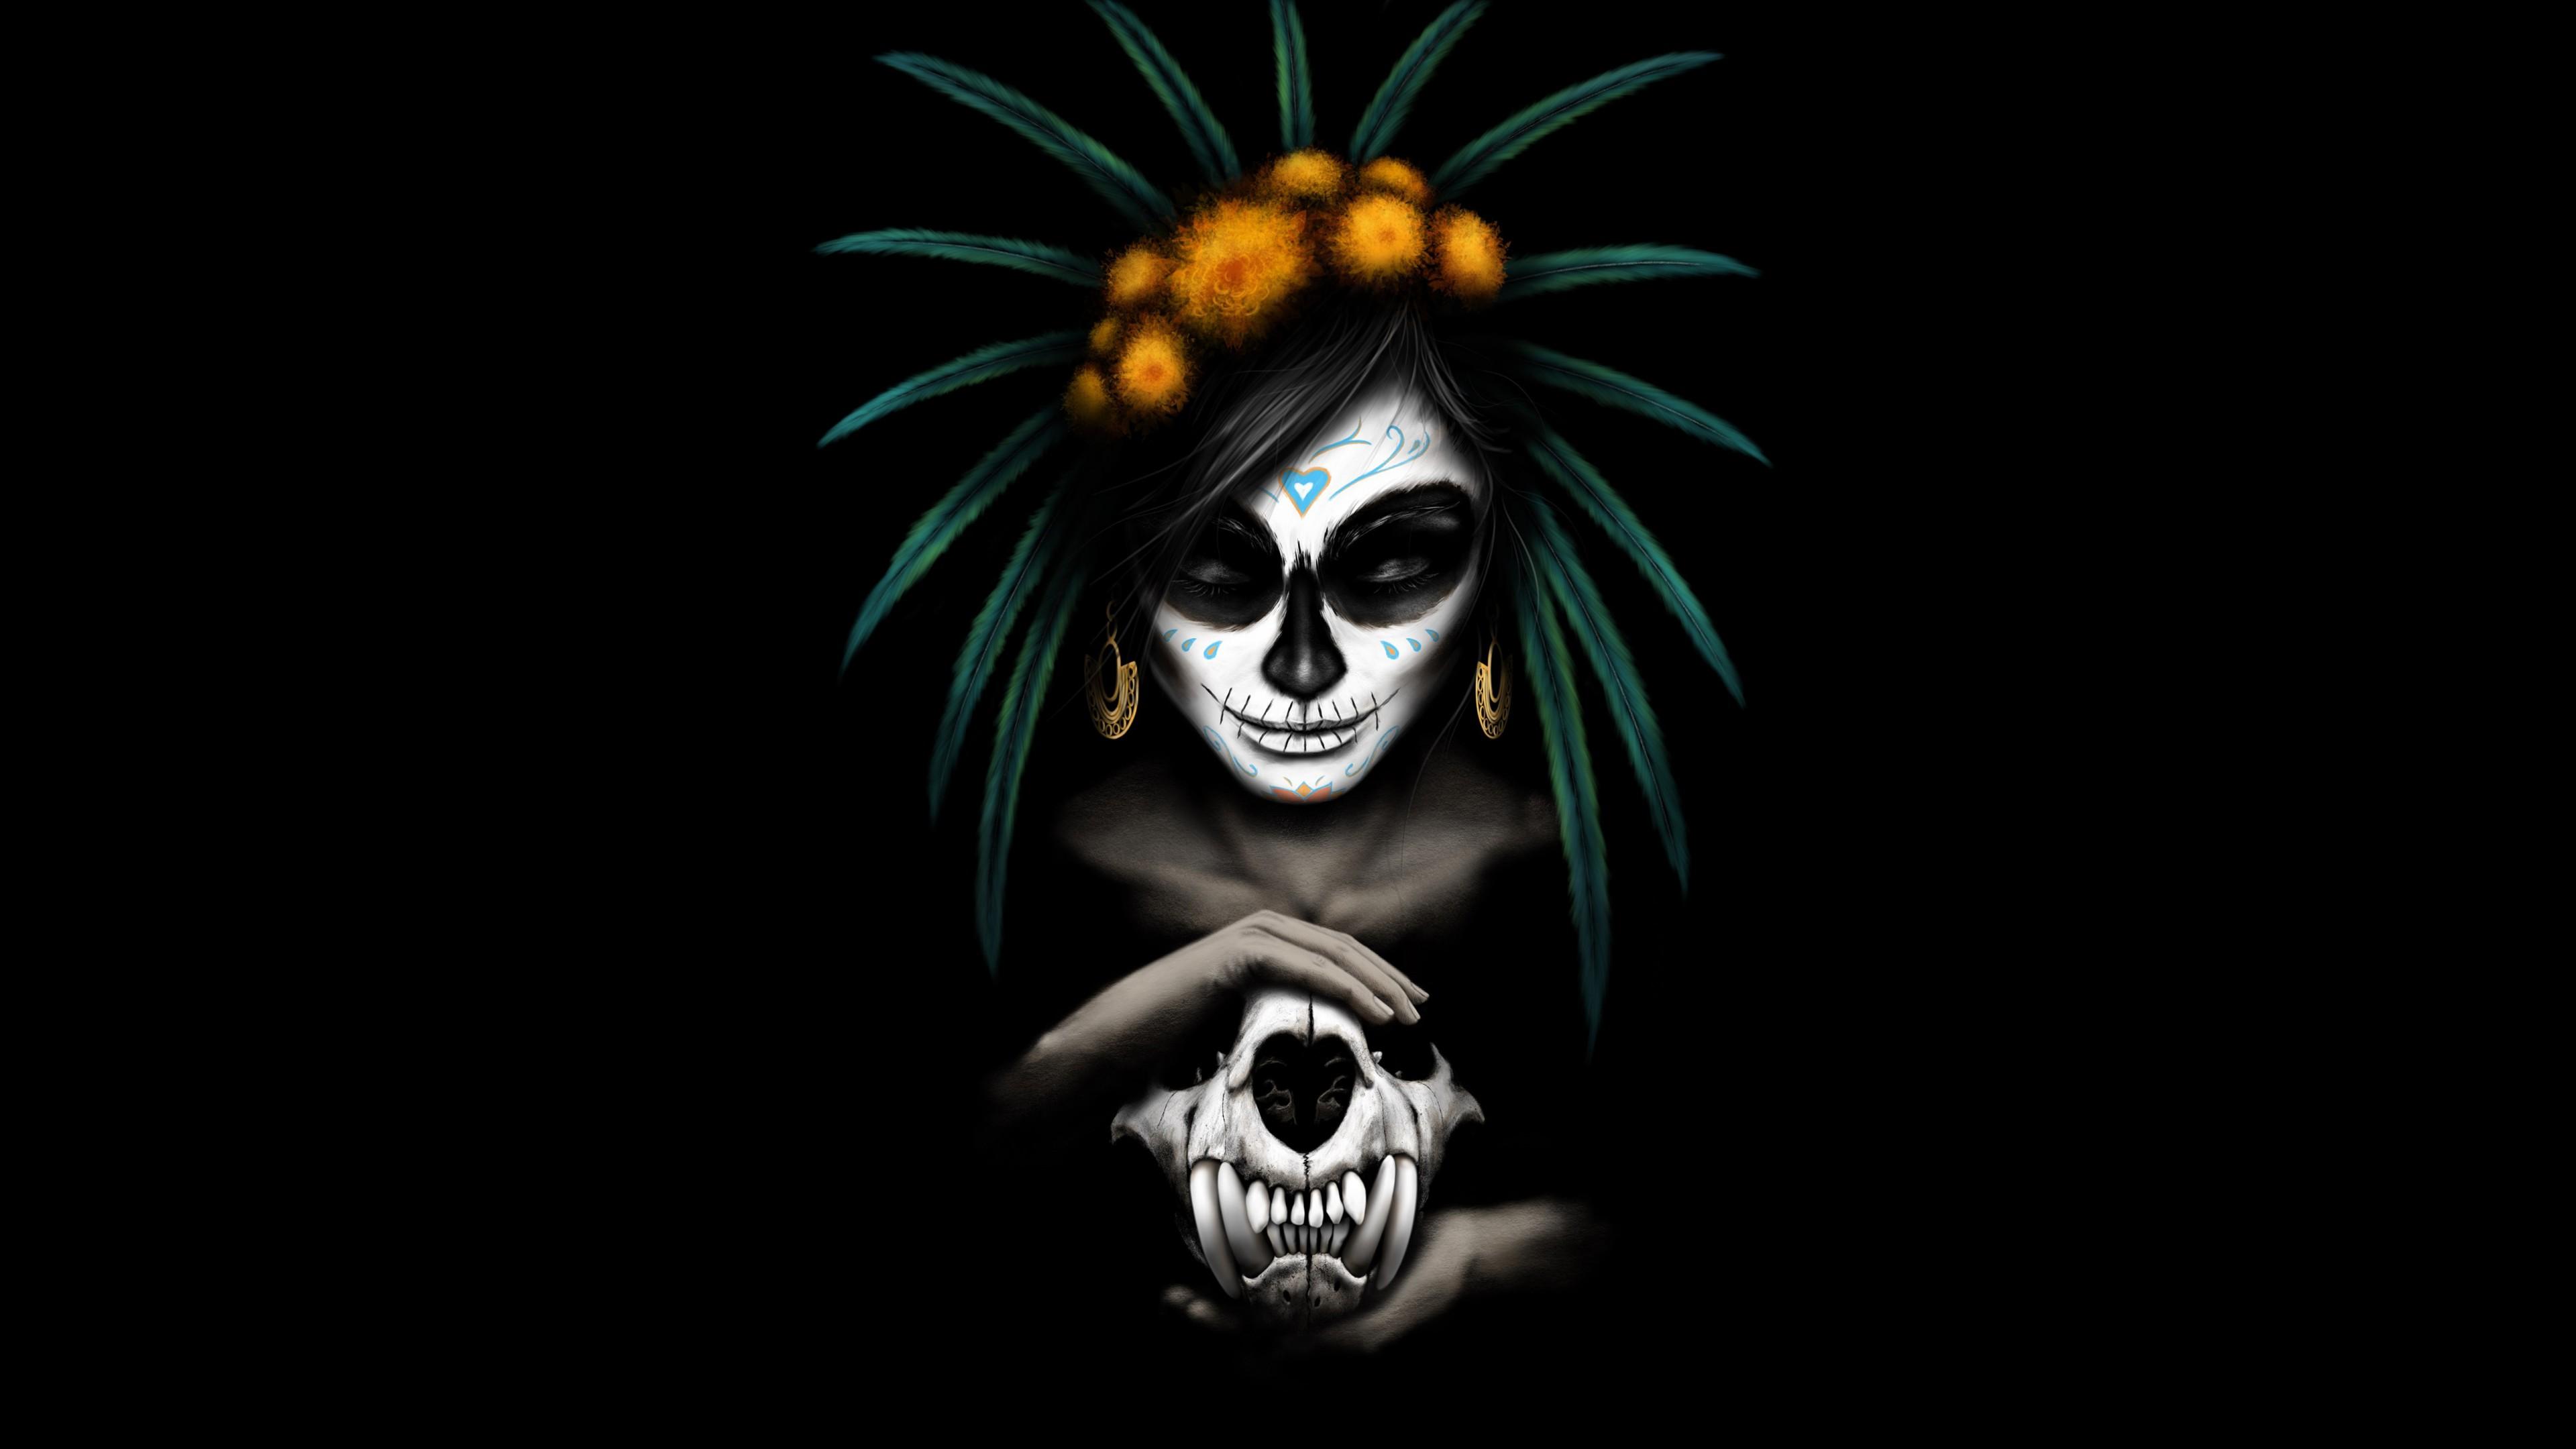 Sugar Skull Girl Wallpaper Mexican Catrina 5k Wallpapers Hd Wallpapers Id 25140